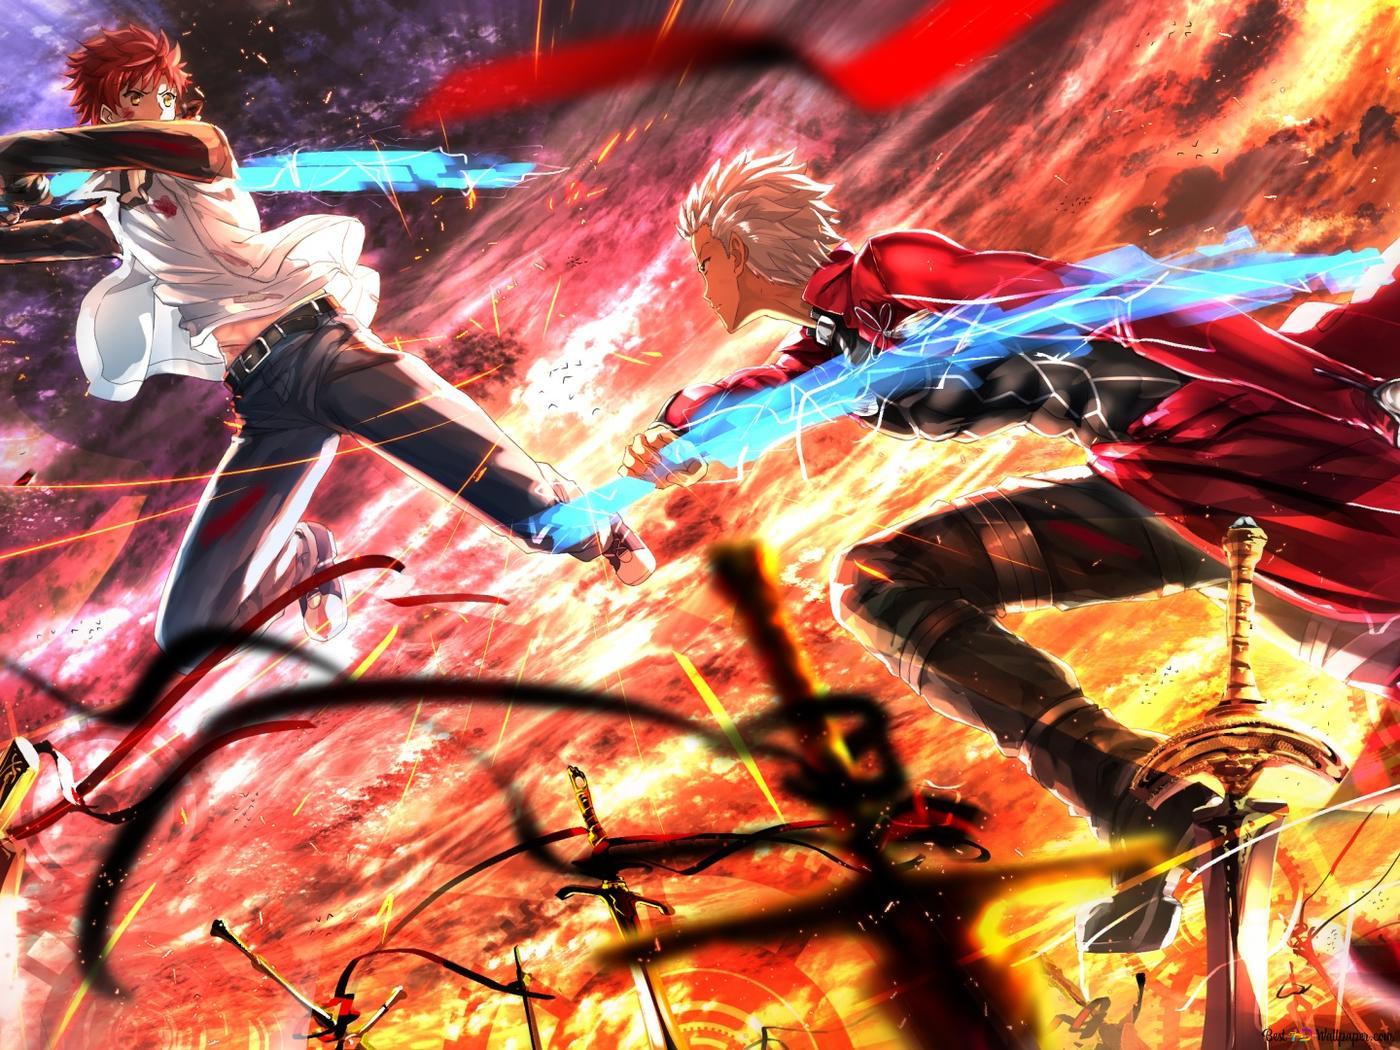 Fate Stay Night Unlimited Blade Works Shirou Emiya Vs Emiya Hd